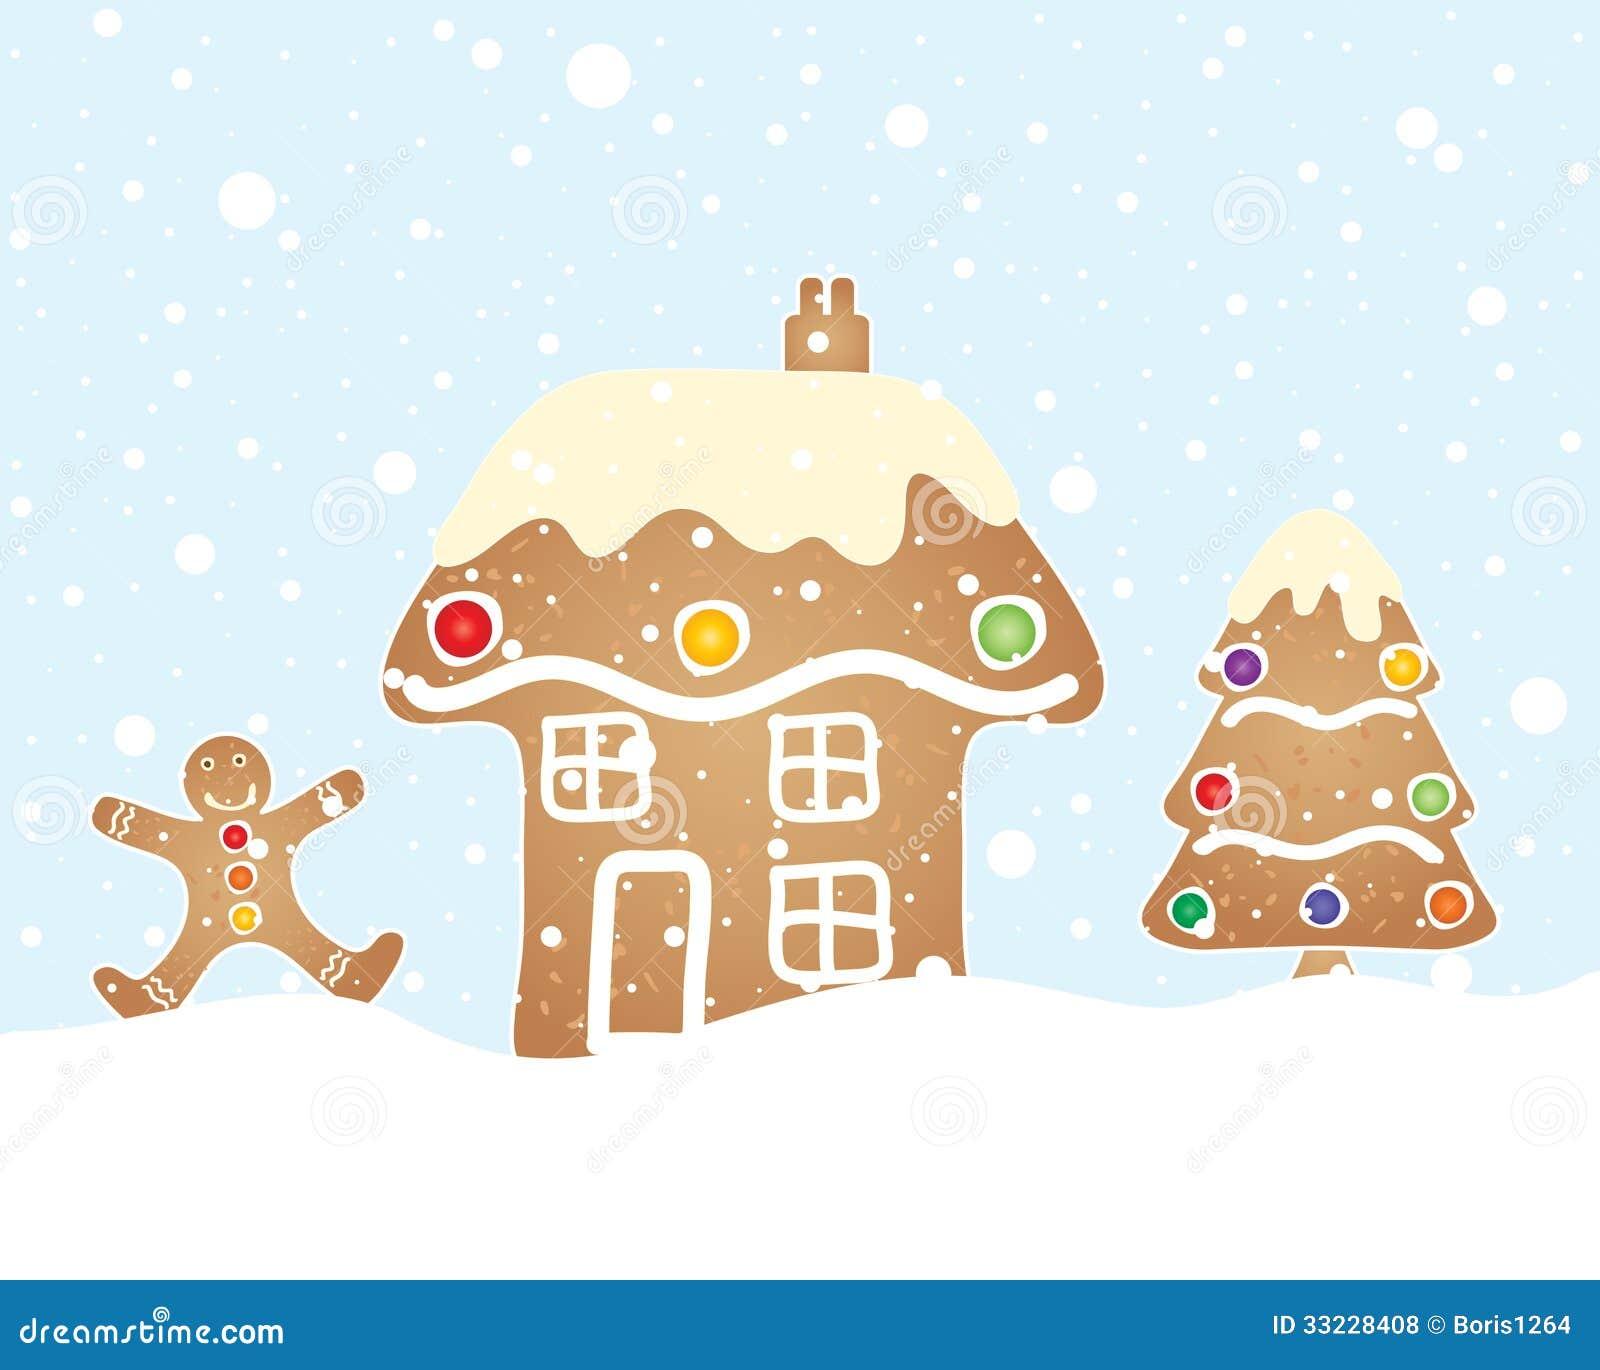 Christmas Tree With Snowflakes